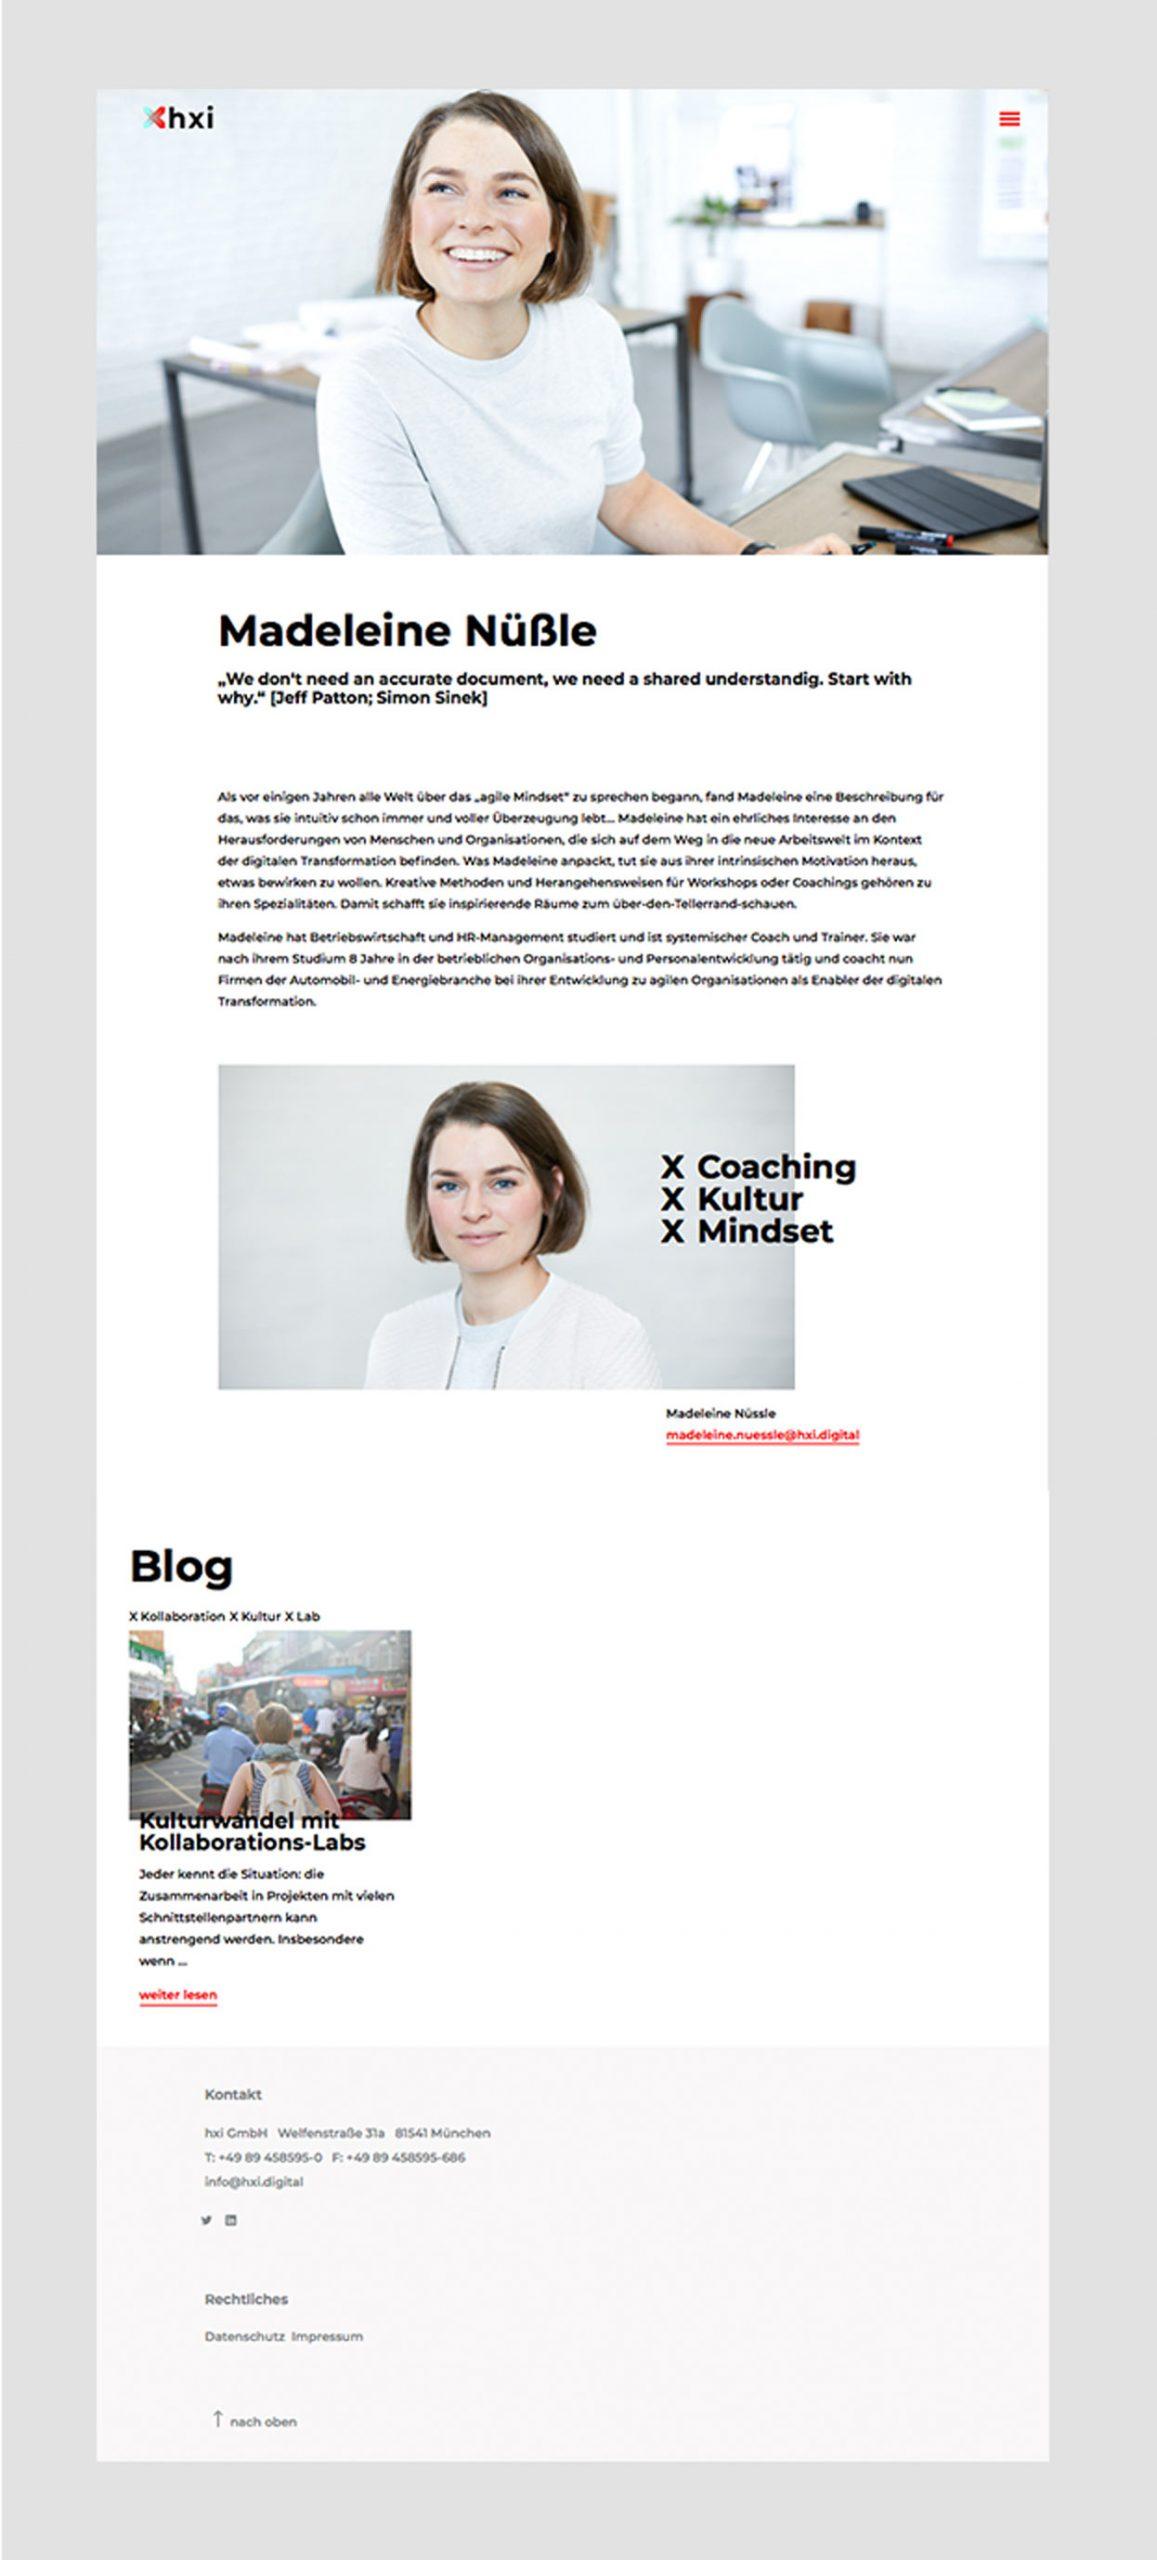 Bürovier Webdesign hxi ui